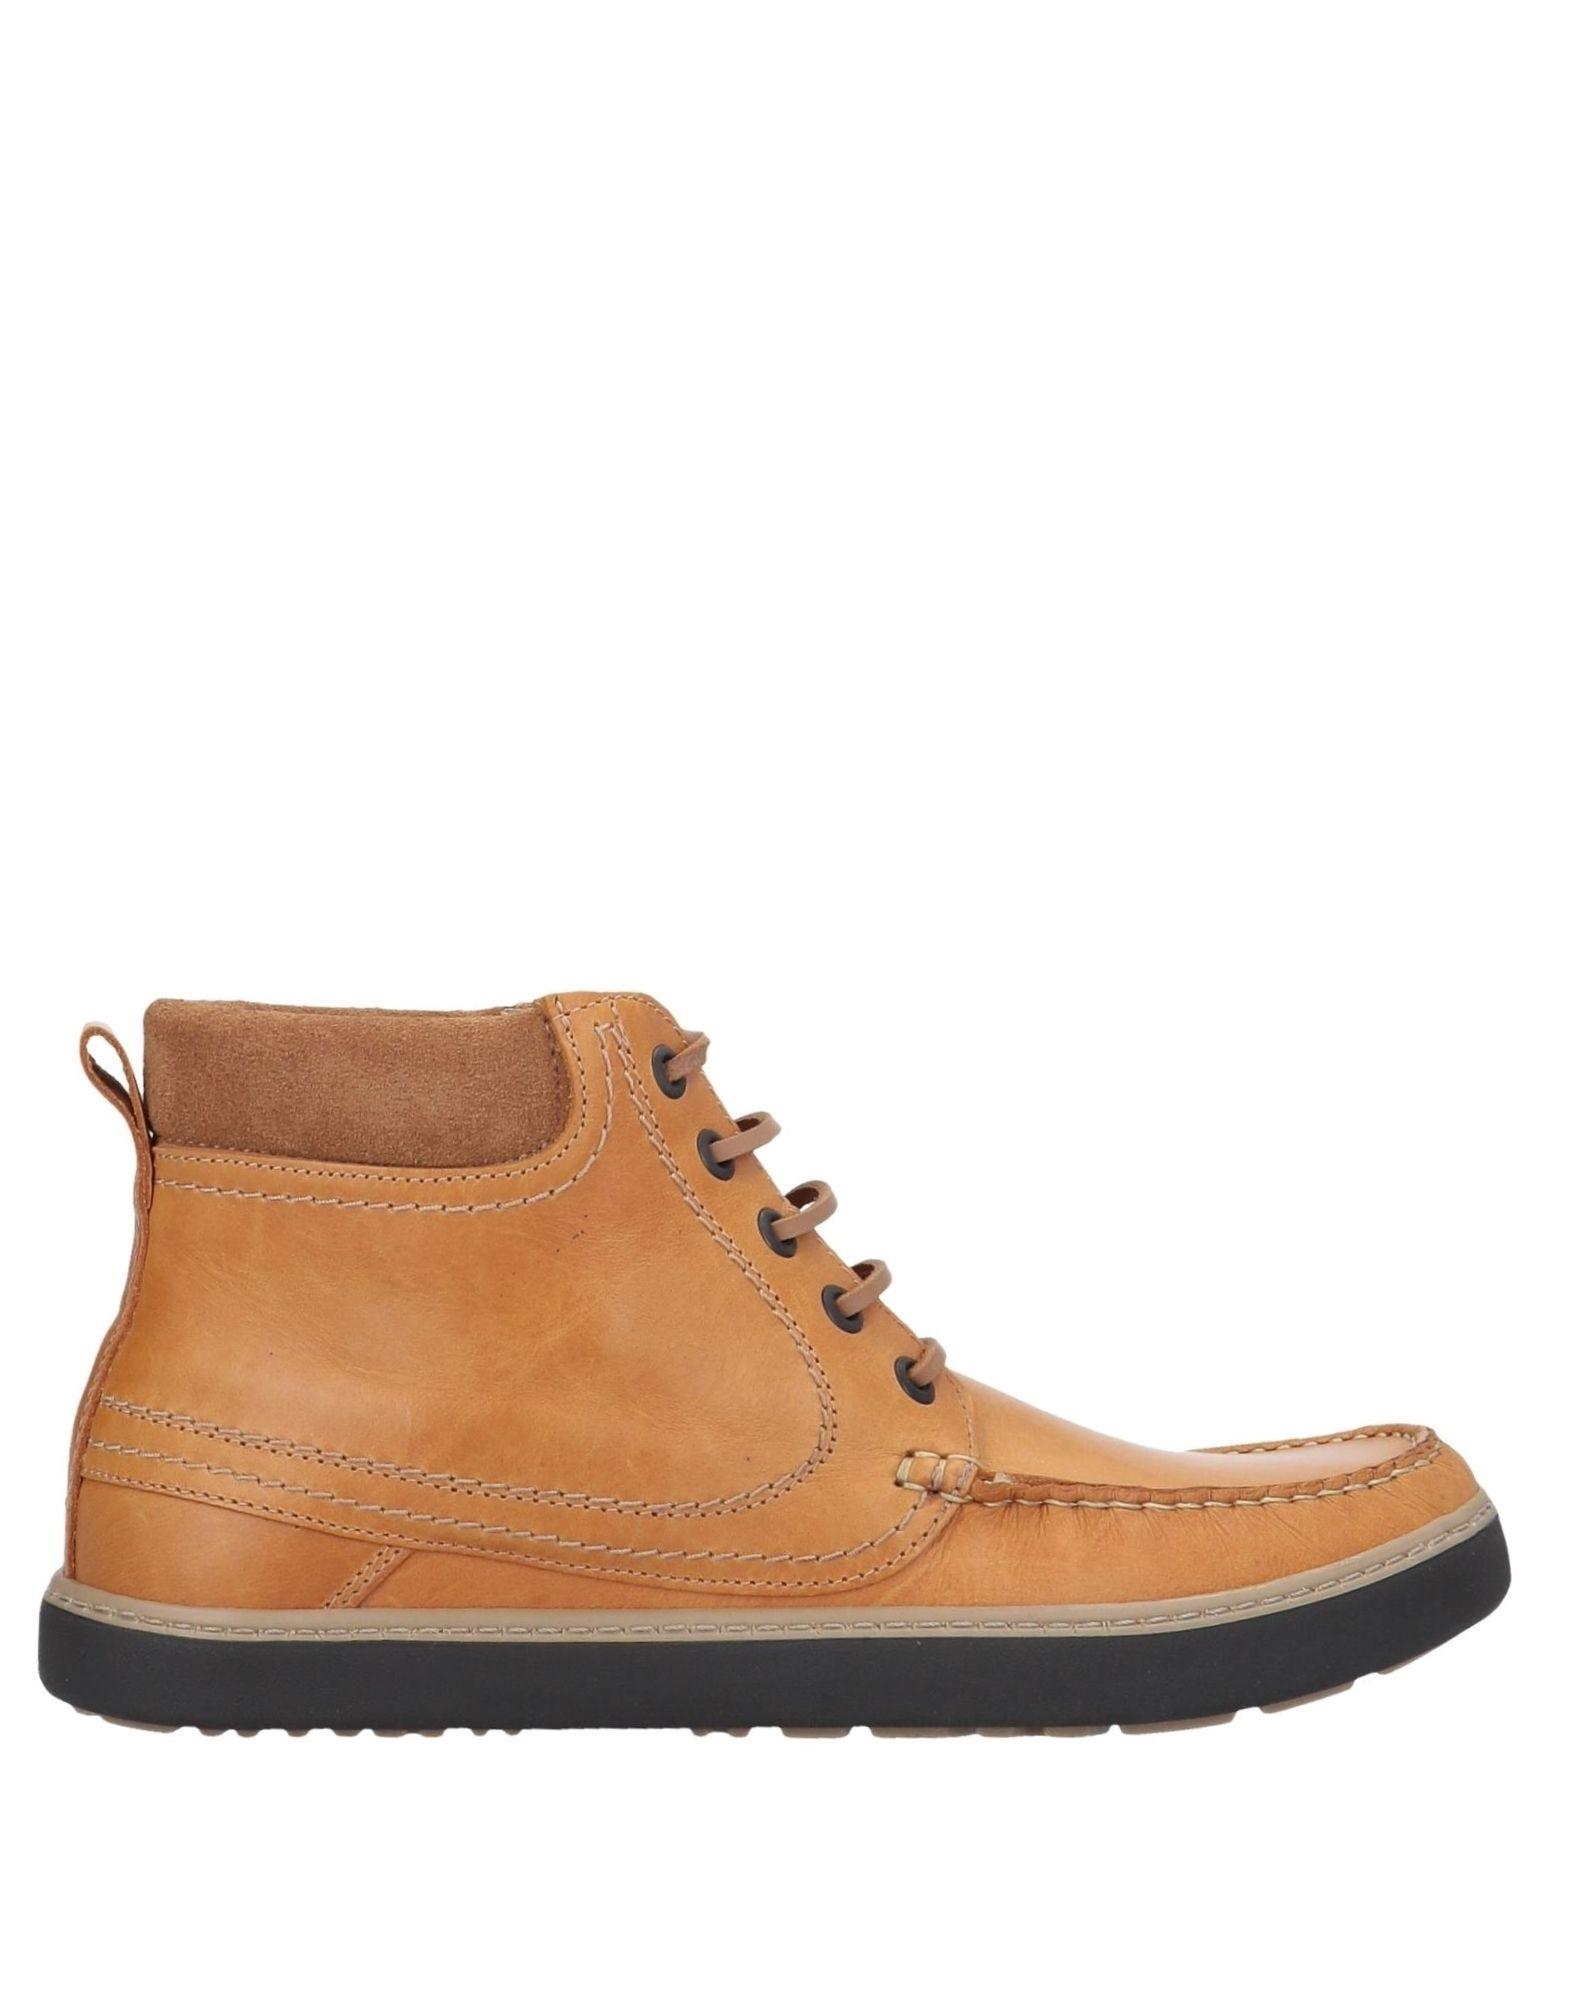 Rabatt echte Schuhe Castellanisimos® Stiefelette Herren  11537955JT